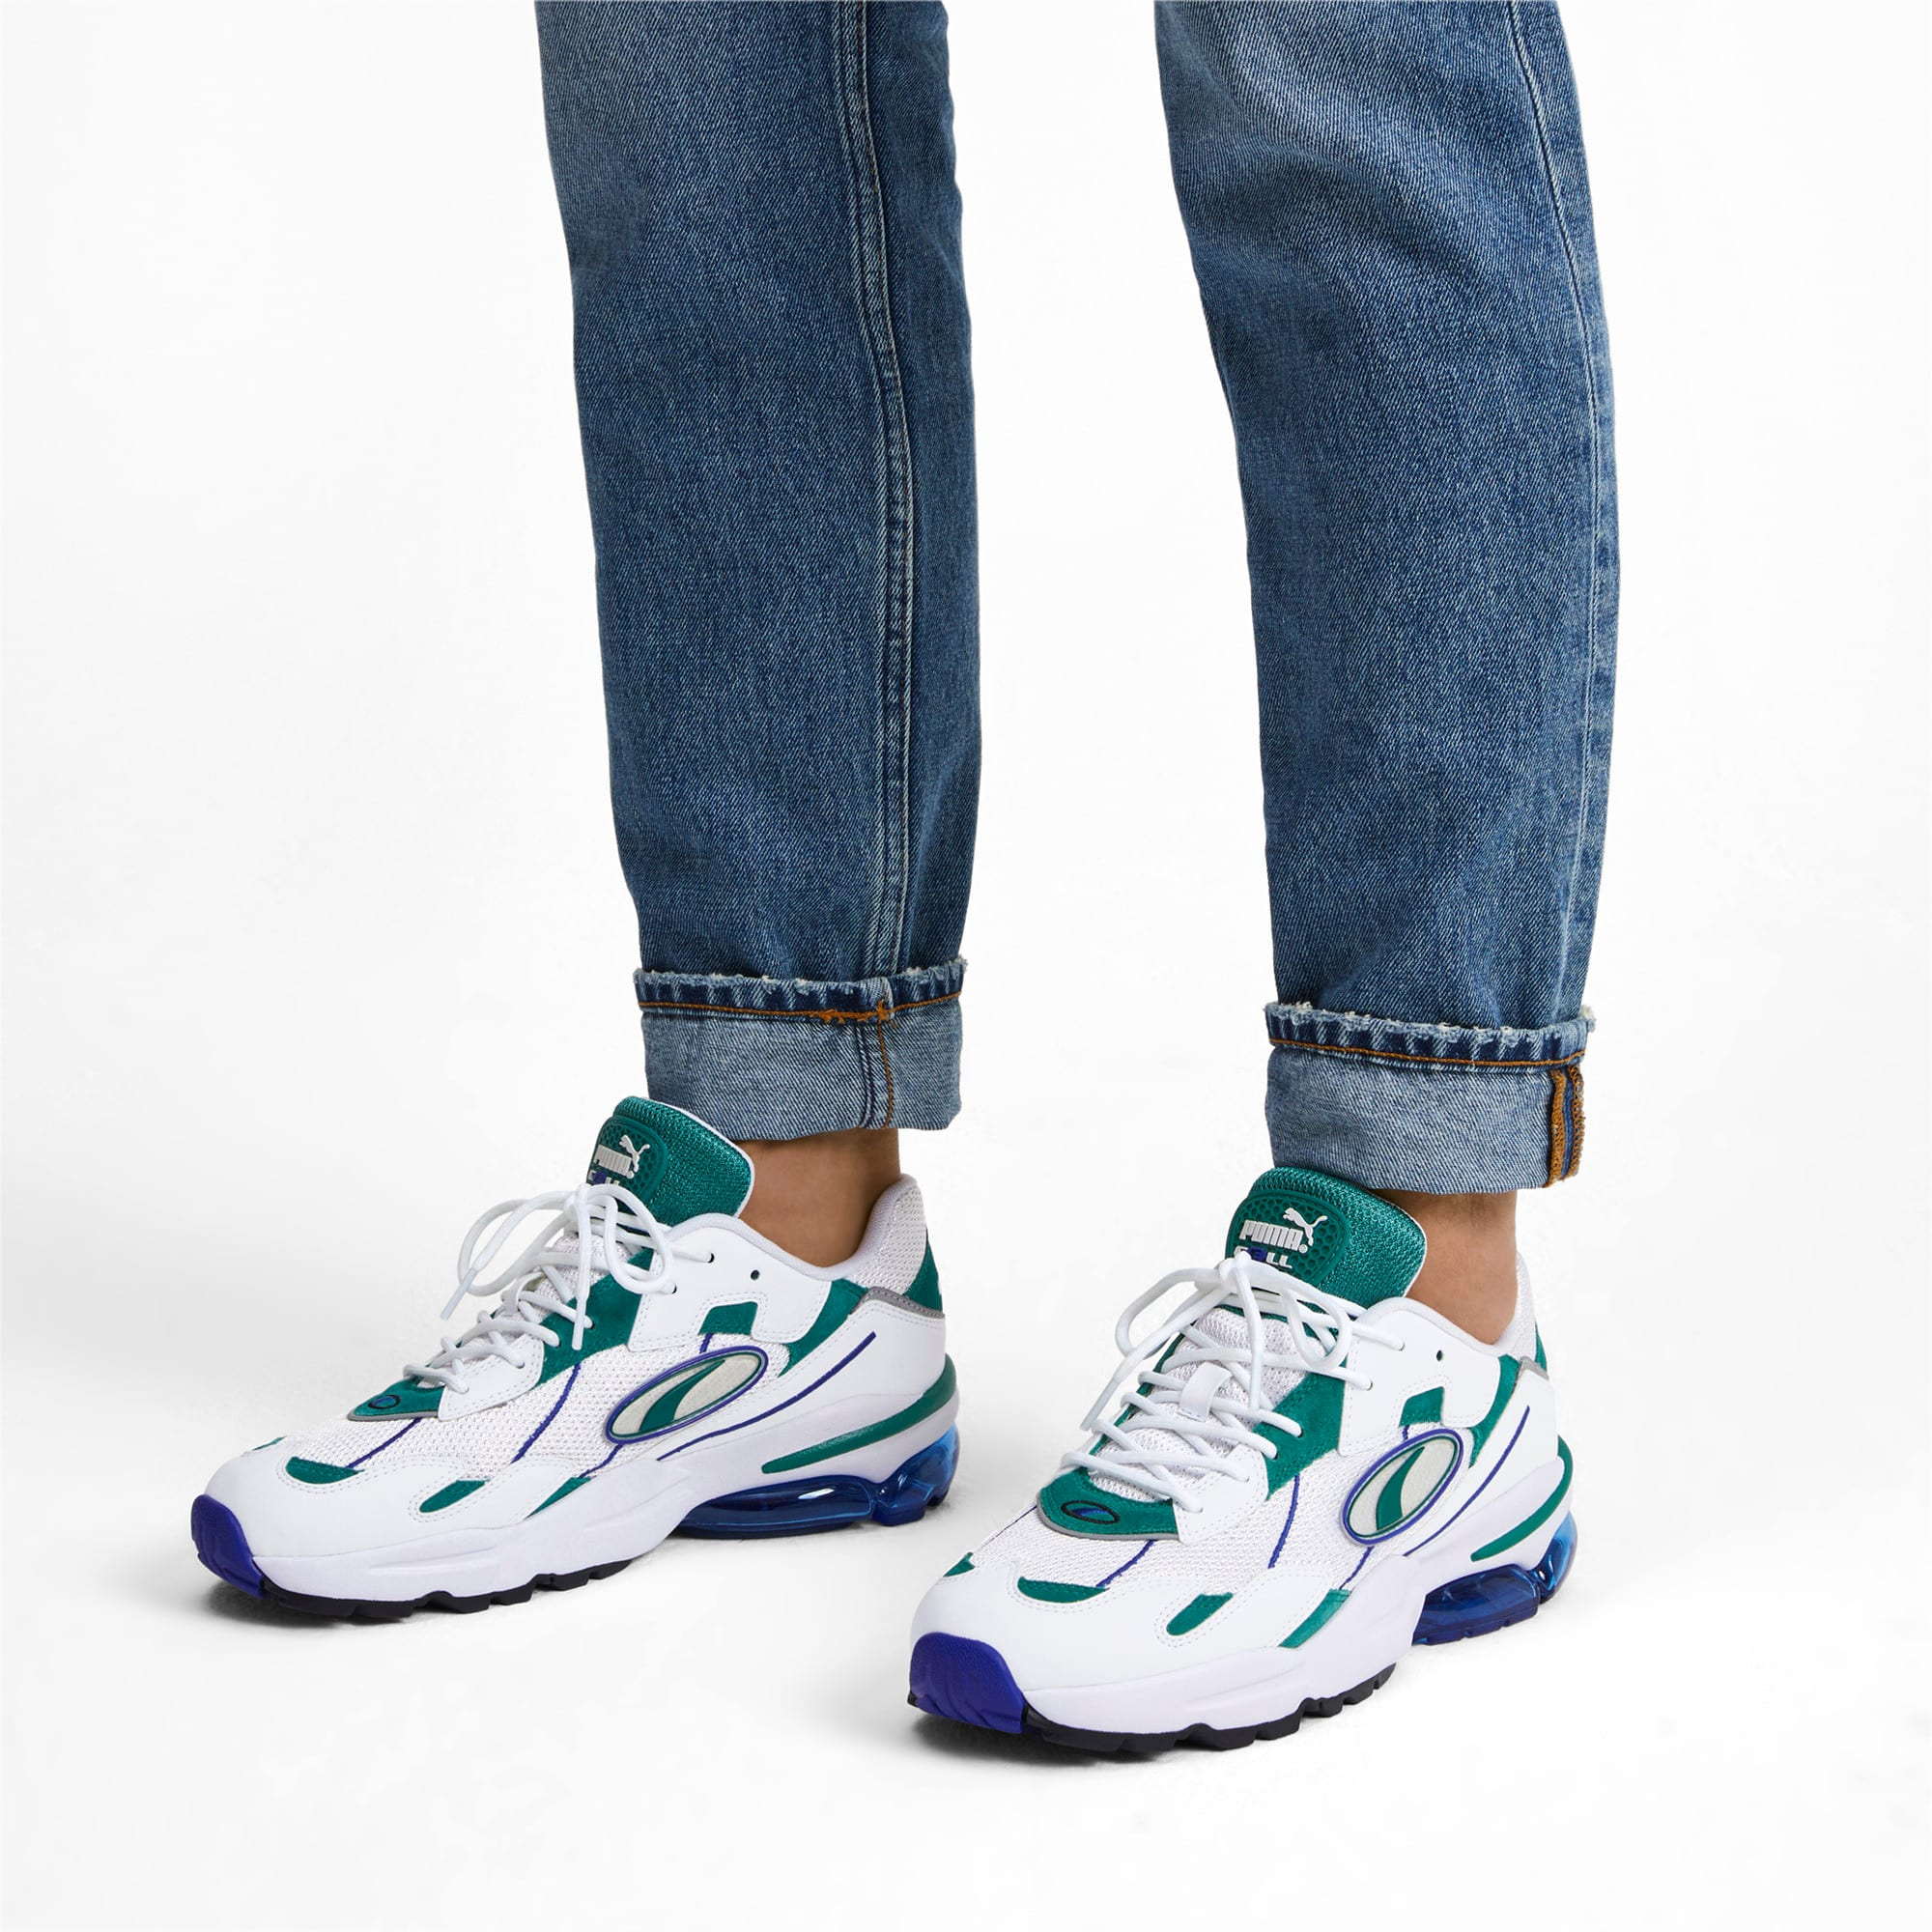 Thumbnail 2 of CELL Ultra OG Pack Sneakers, Puma White-Teal Green, medium